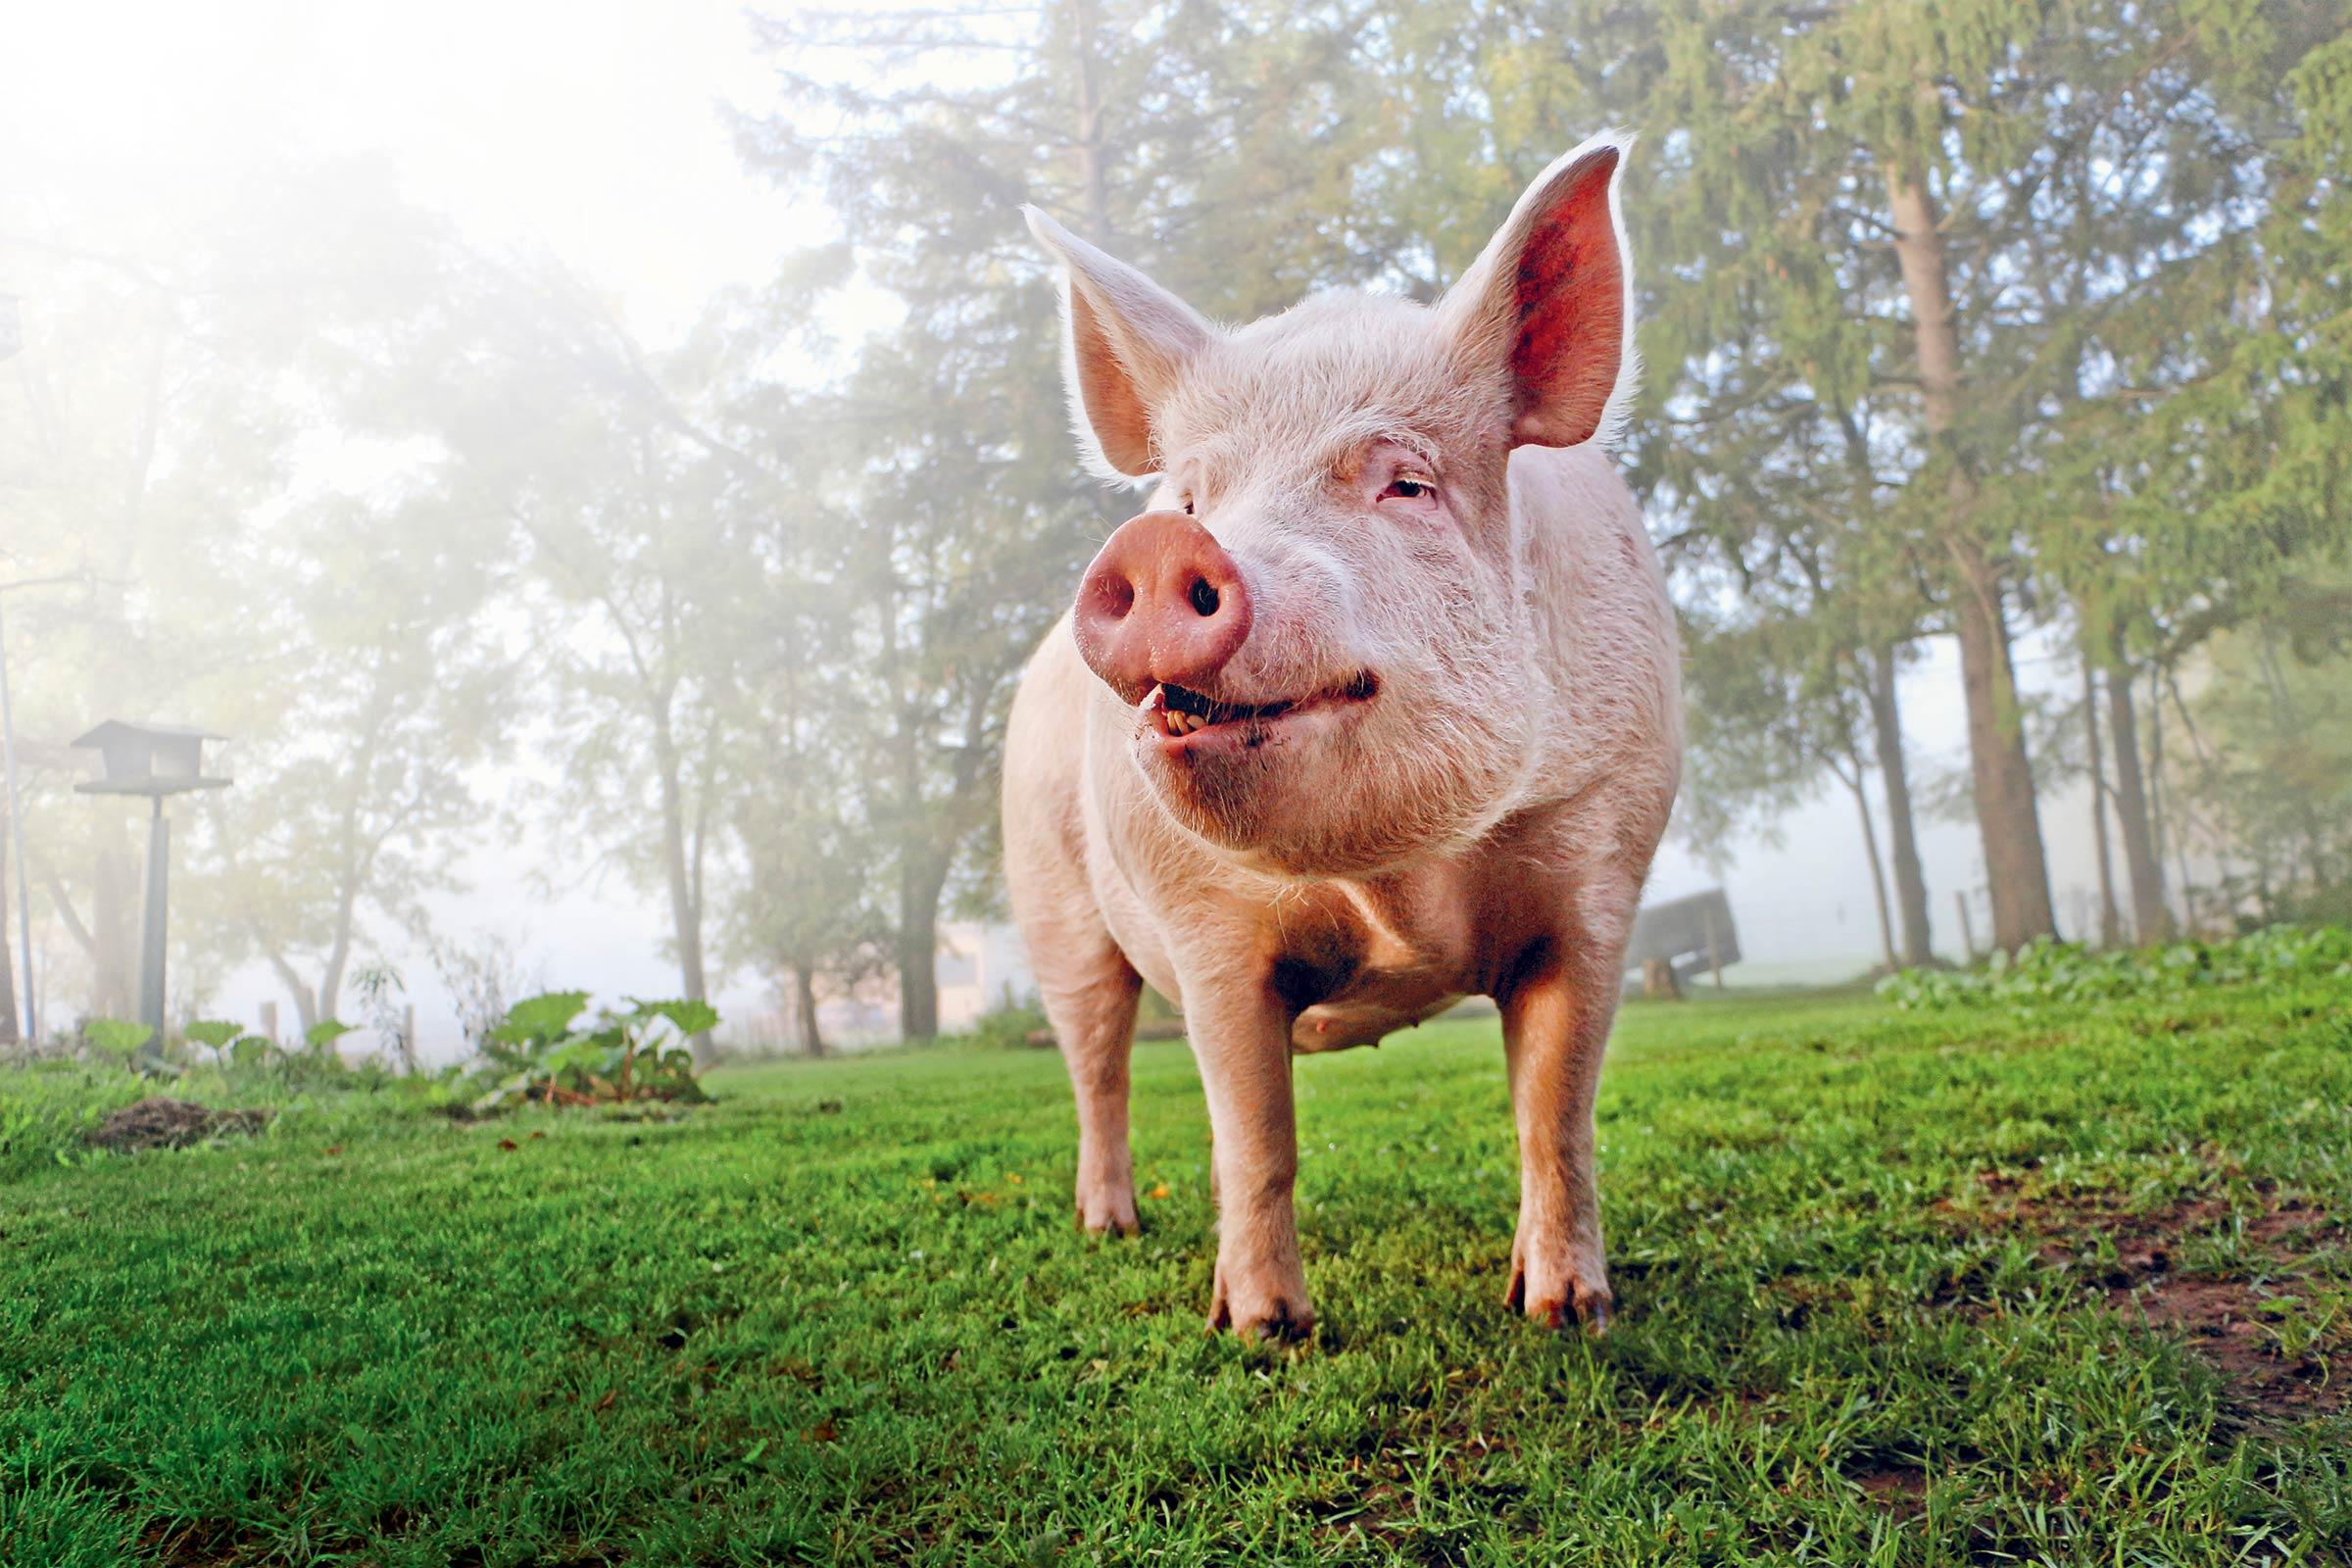 Pig Farm To Table Blog Post Image